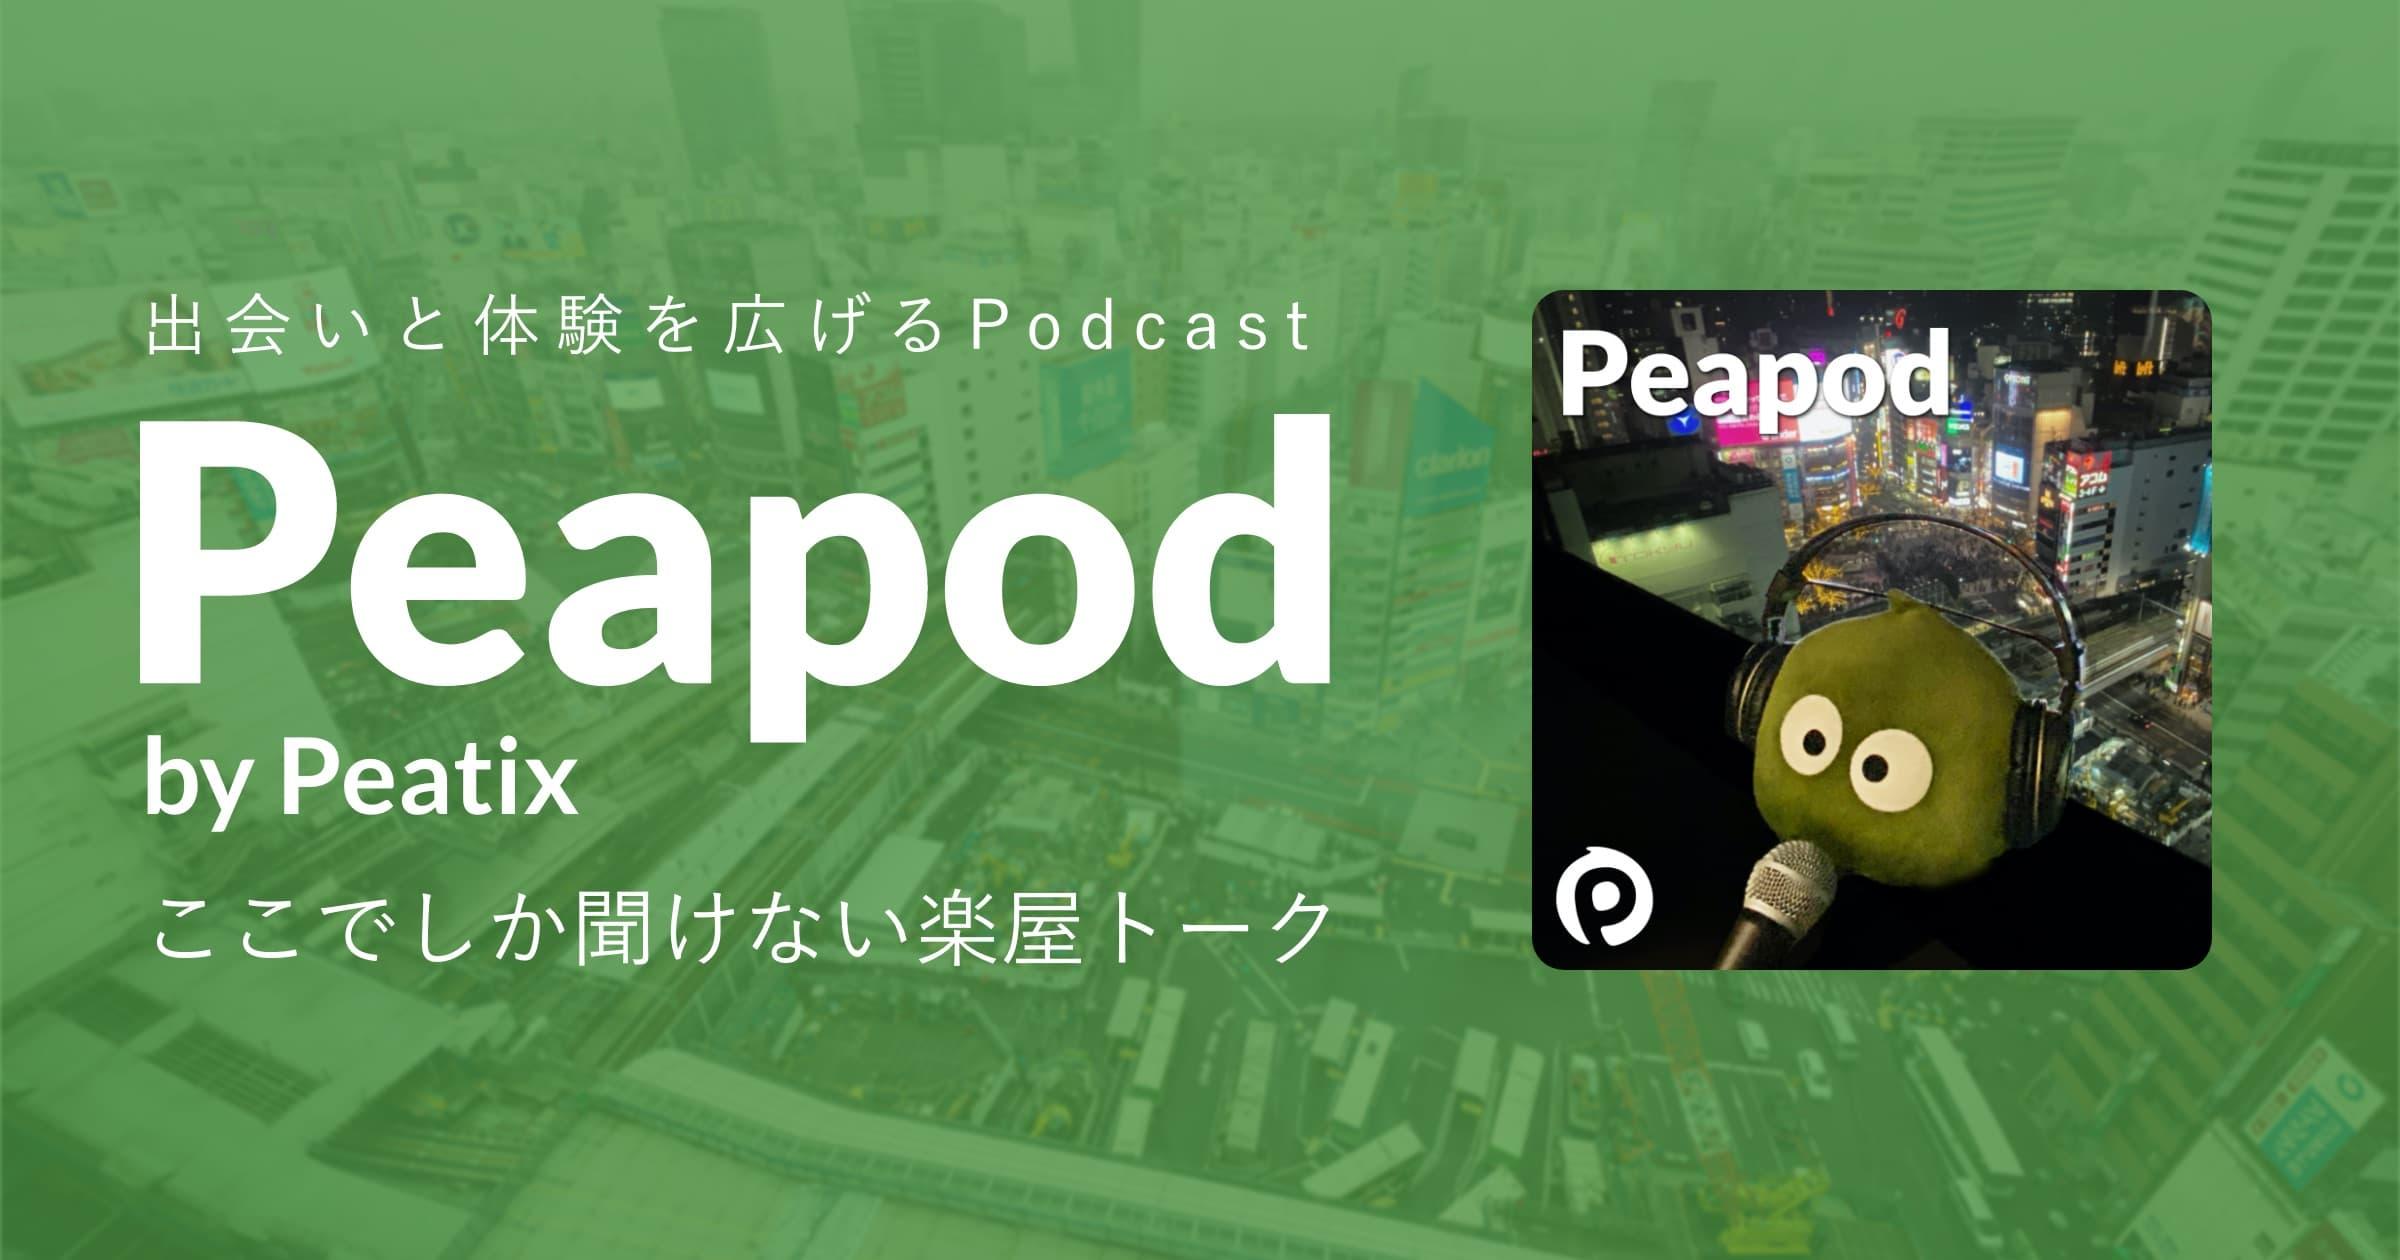 Peapod by Peatix